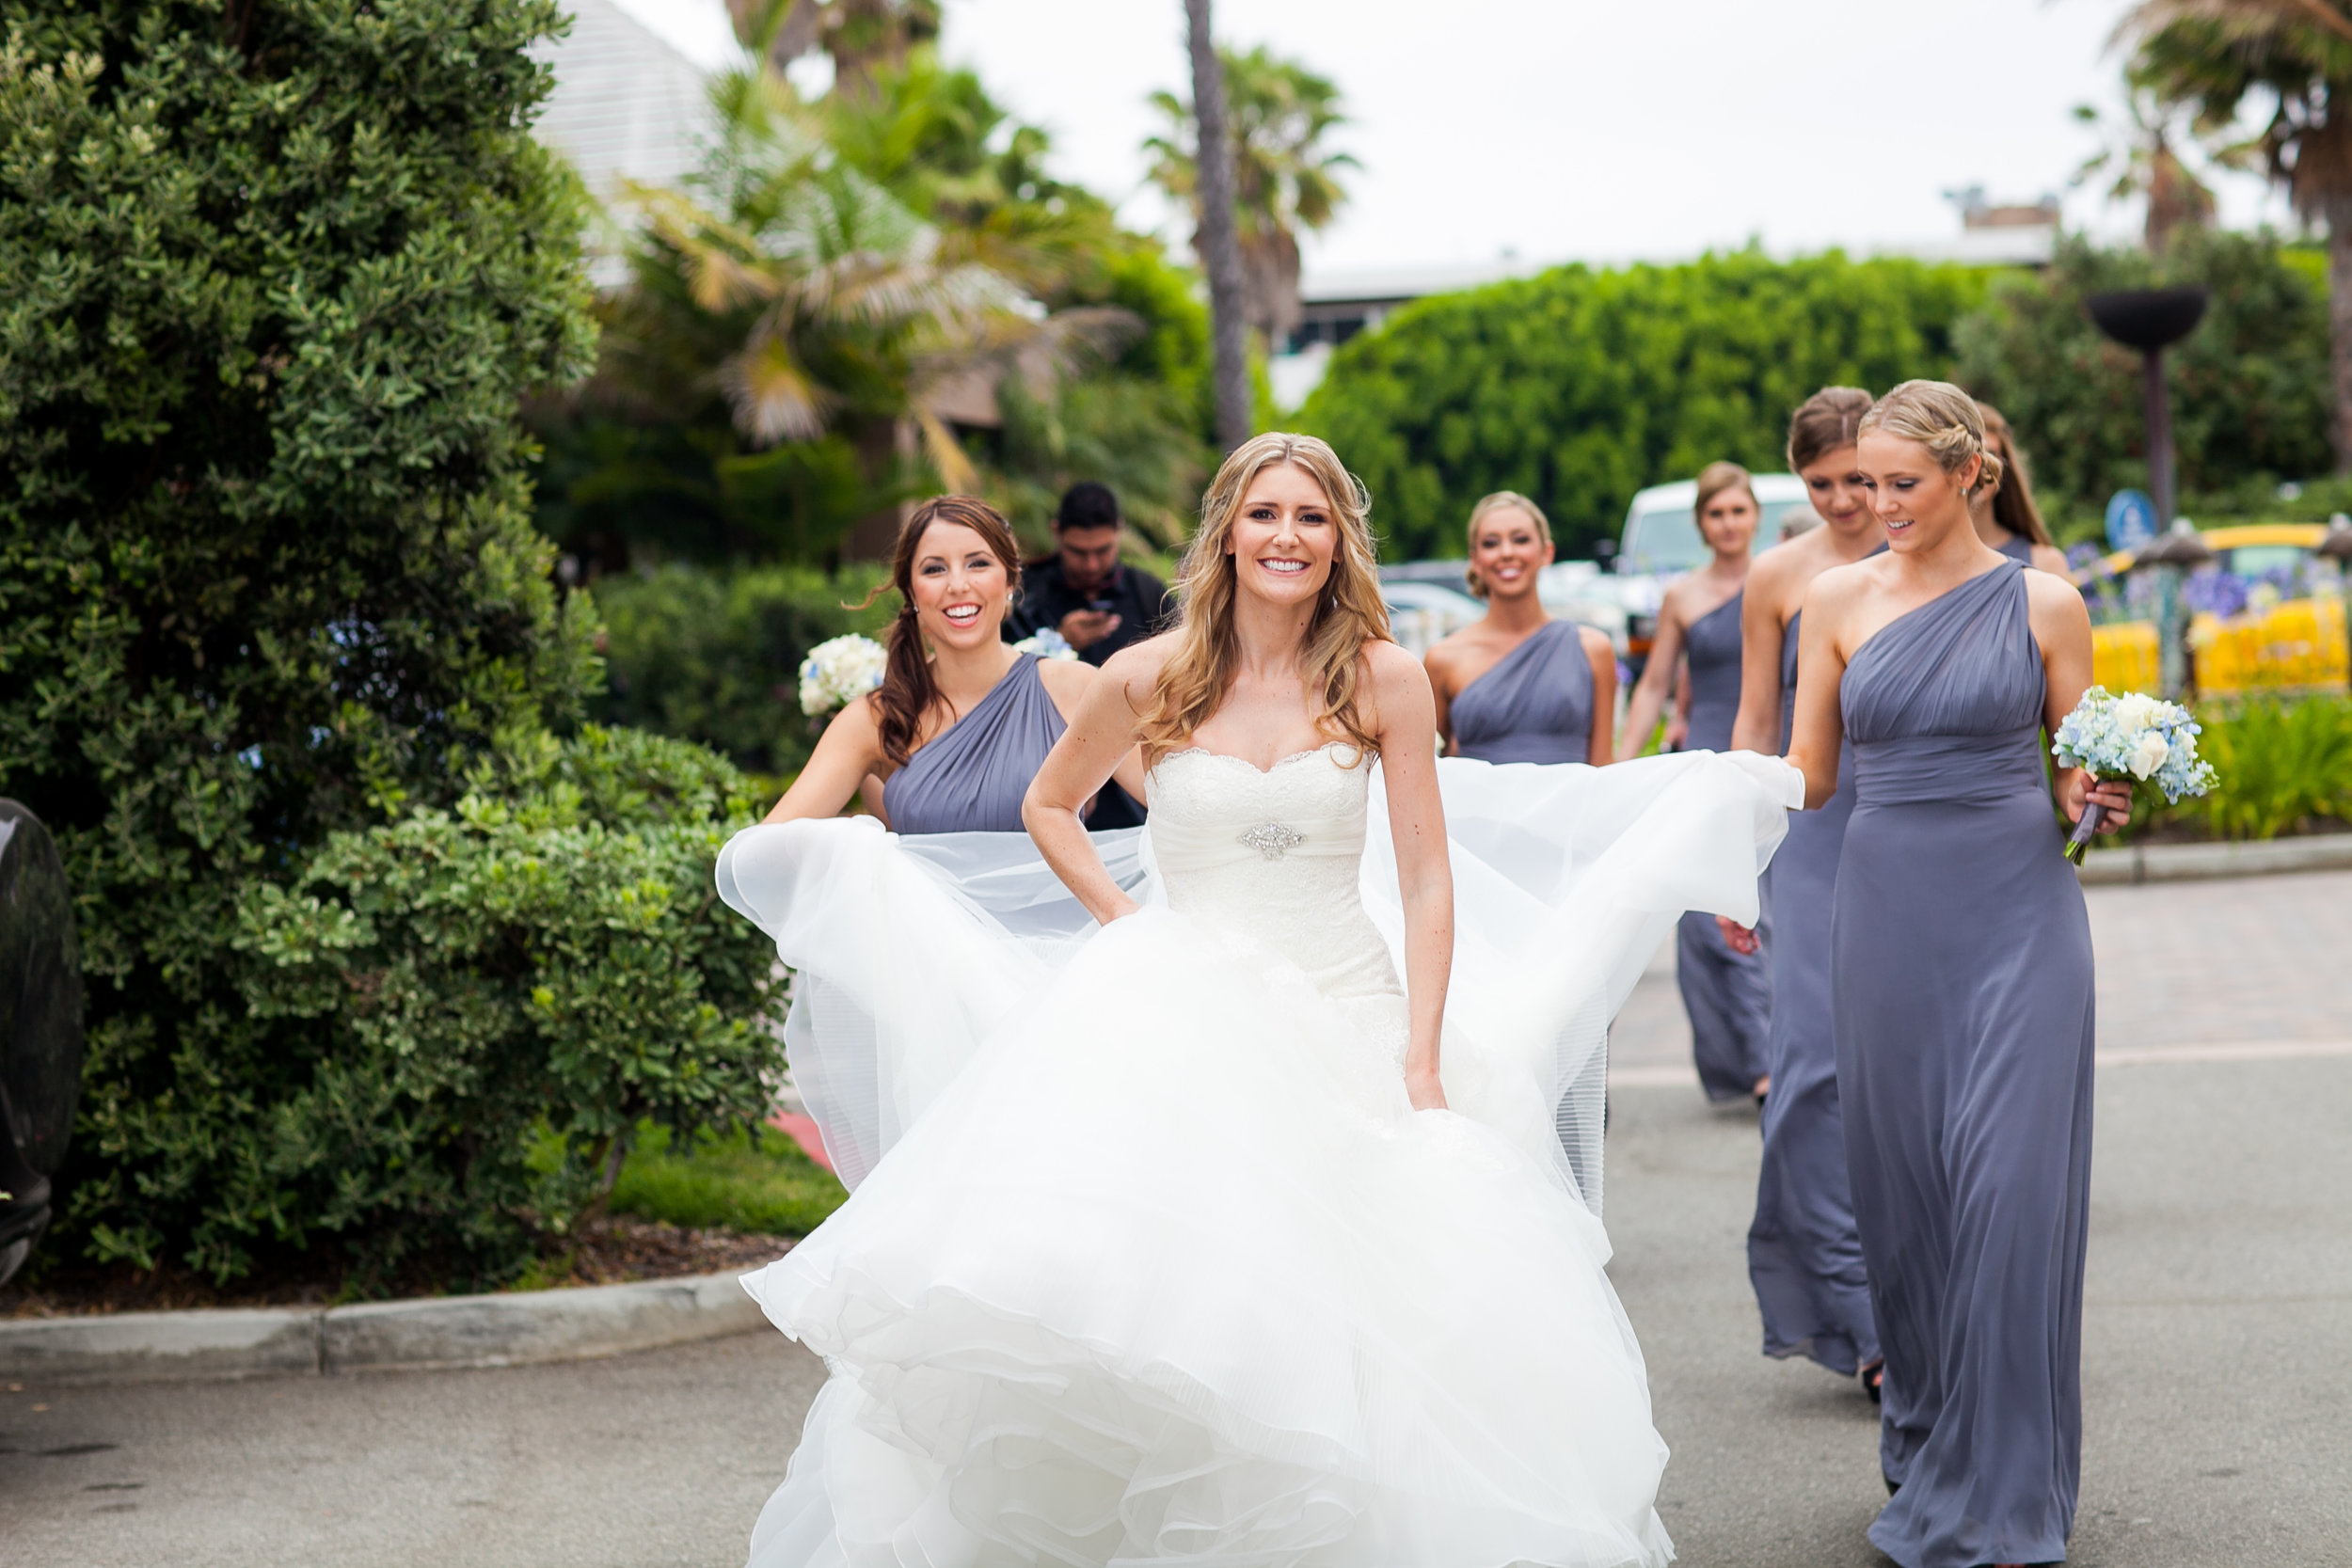 2018 Trending Wedding Themes - Tips for Choosing A Wedding Theme - Wedding Inspiration - The Overwhelmed Bride